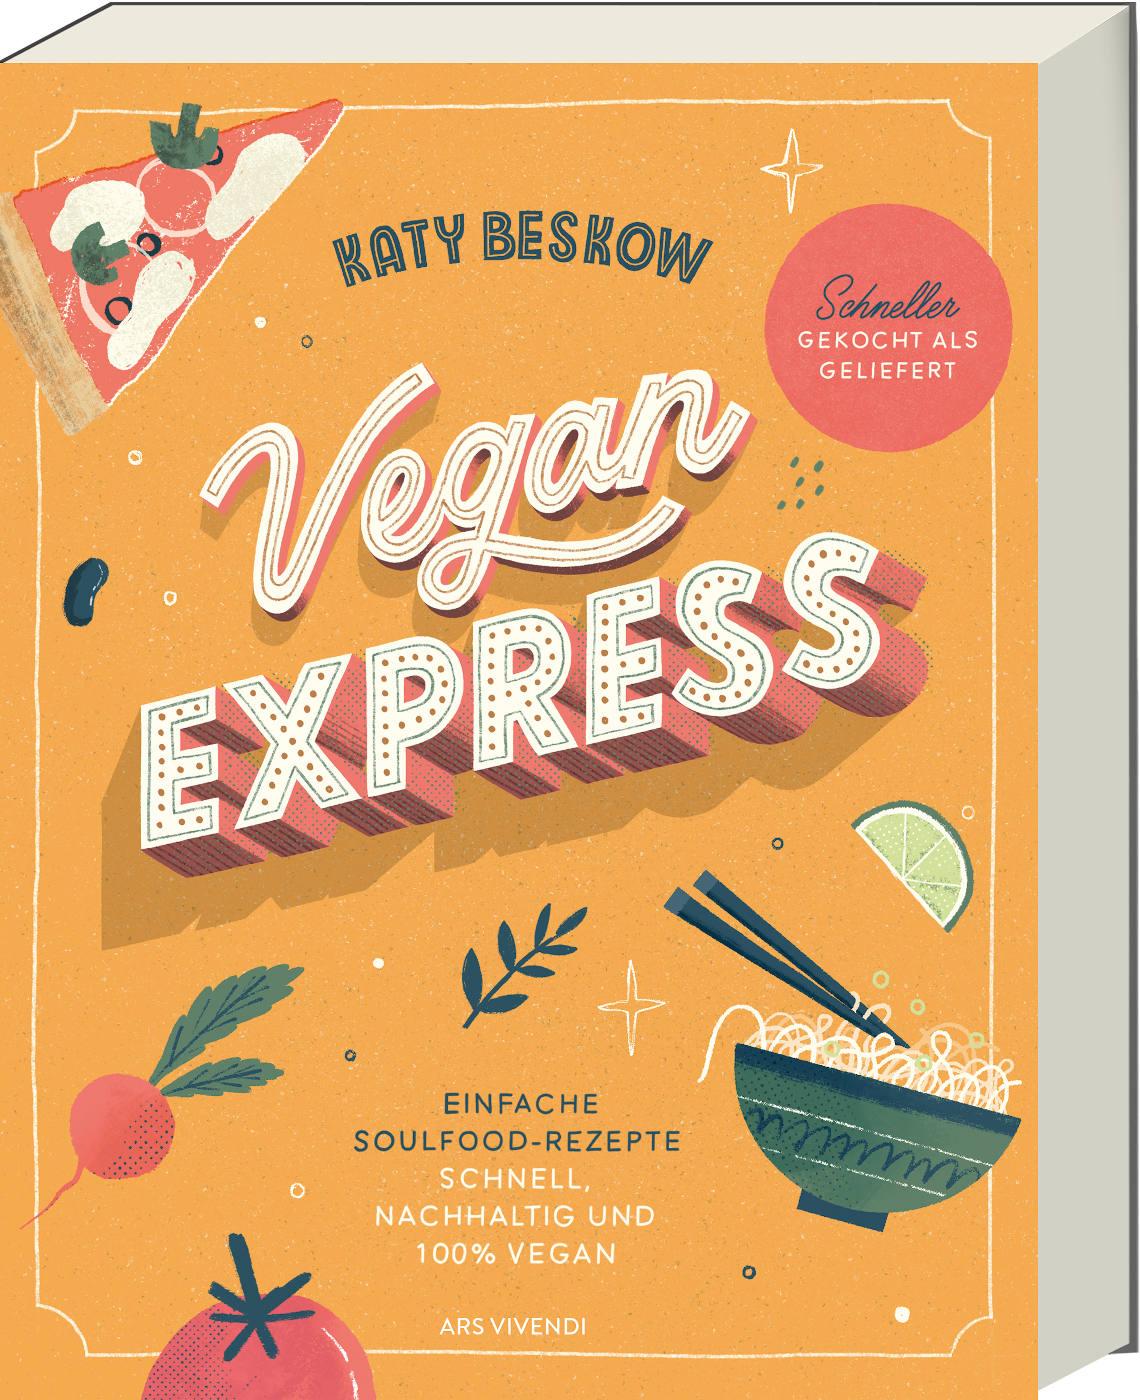 Veganes MAc and Cheese aus Vegan Express // HIMBEER